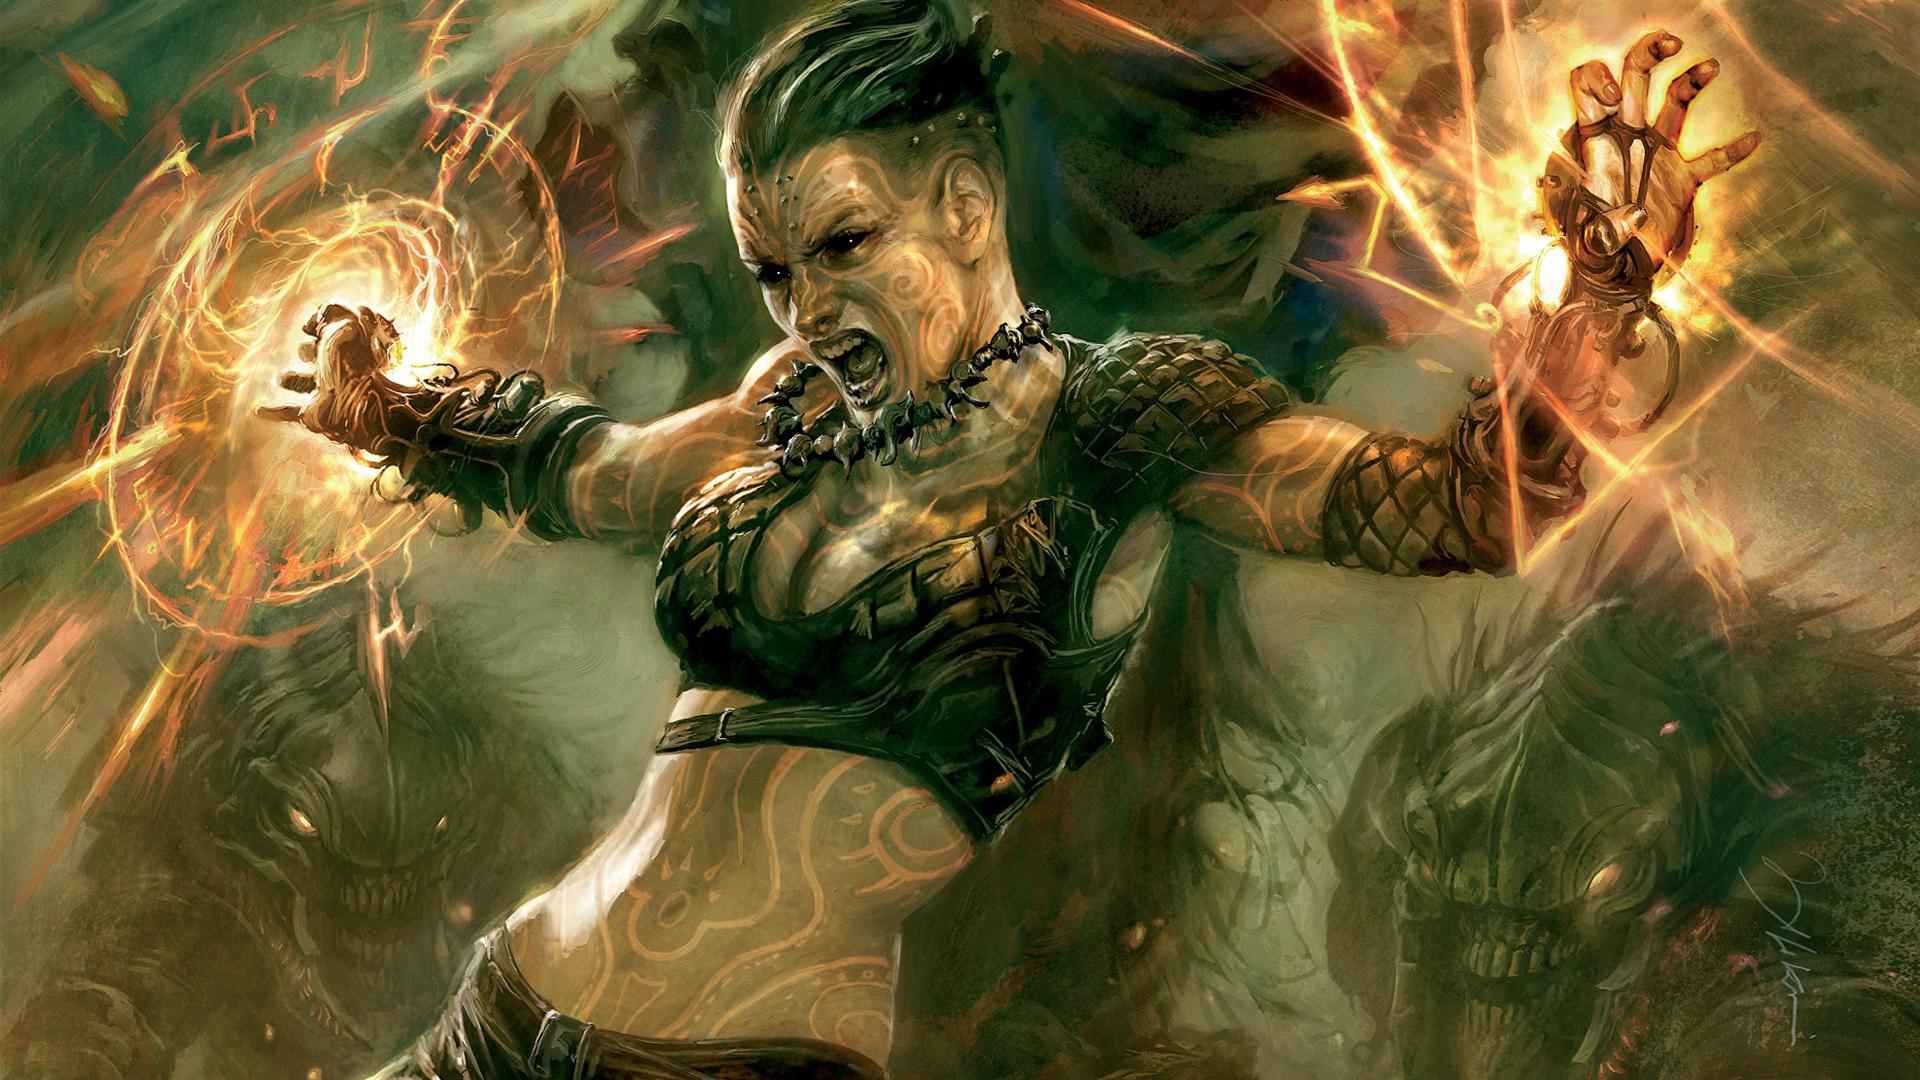 Девушка магия воин фентези обои для